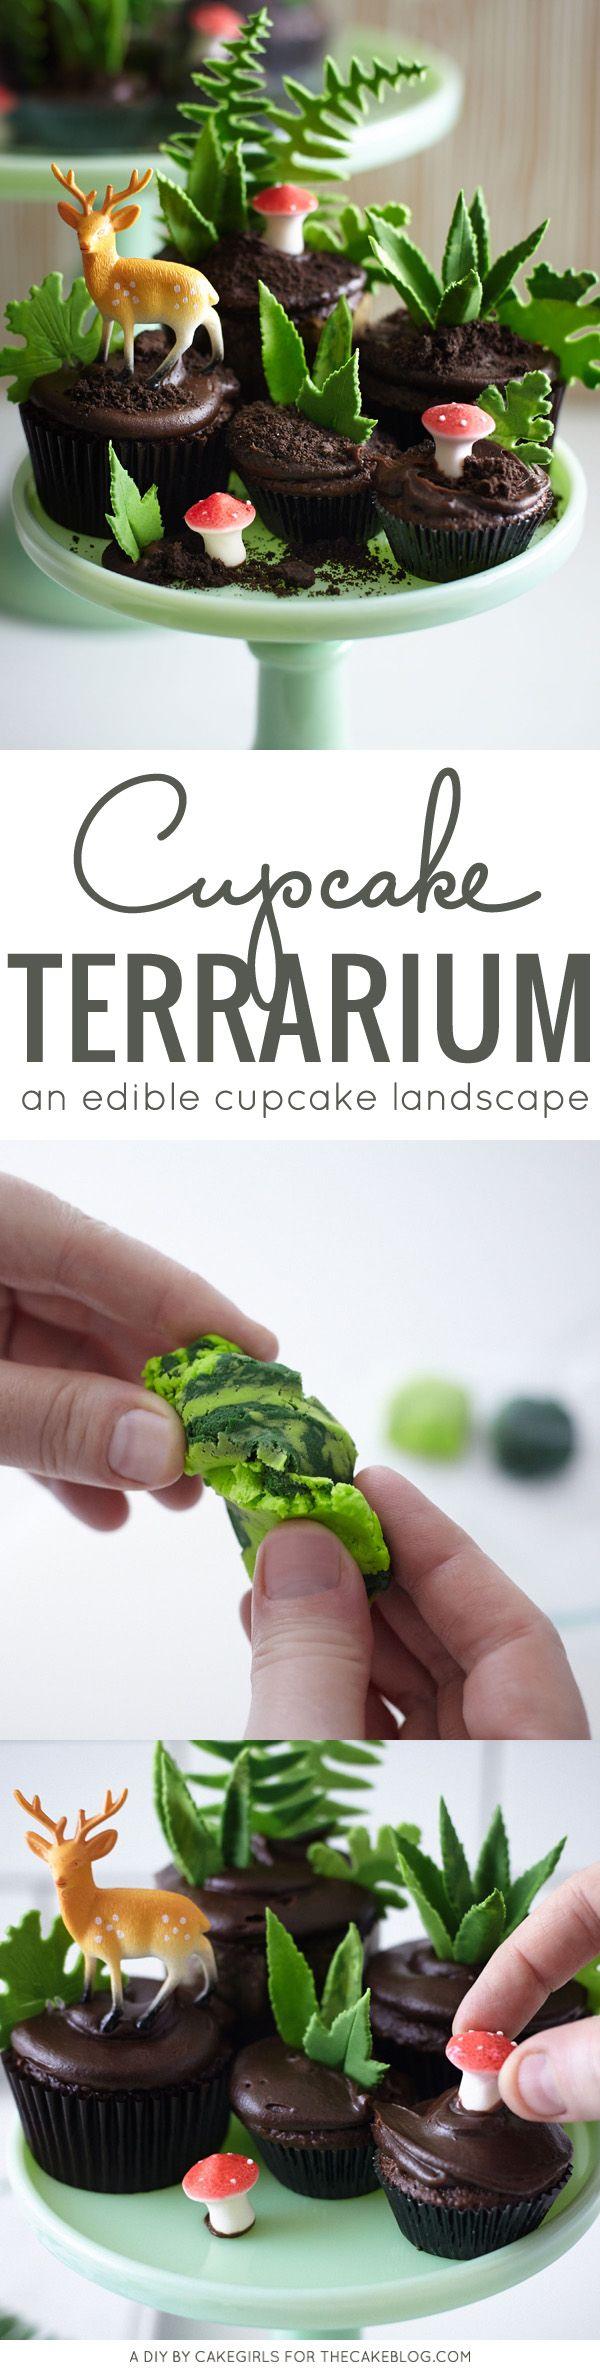 an edible cupcake landscape | DIY Cupcake Terrarium | a cake tutorial by Cakegirls for TheCakeBlog.com